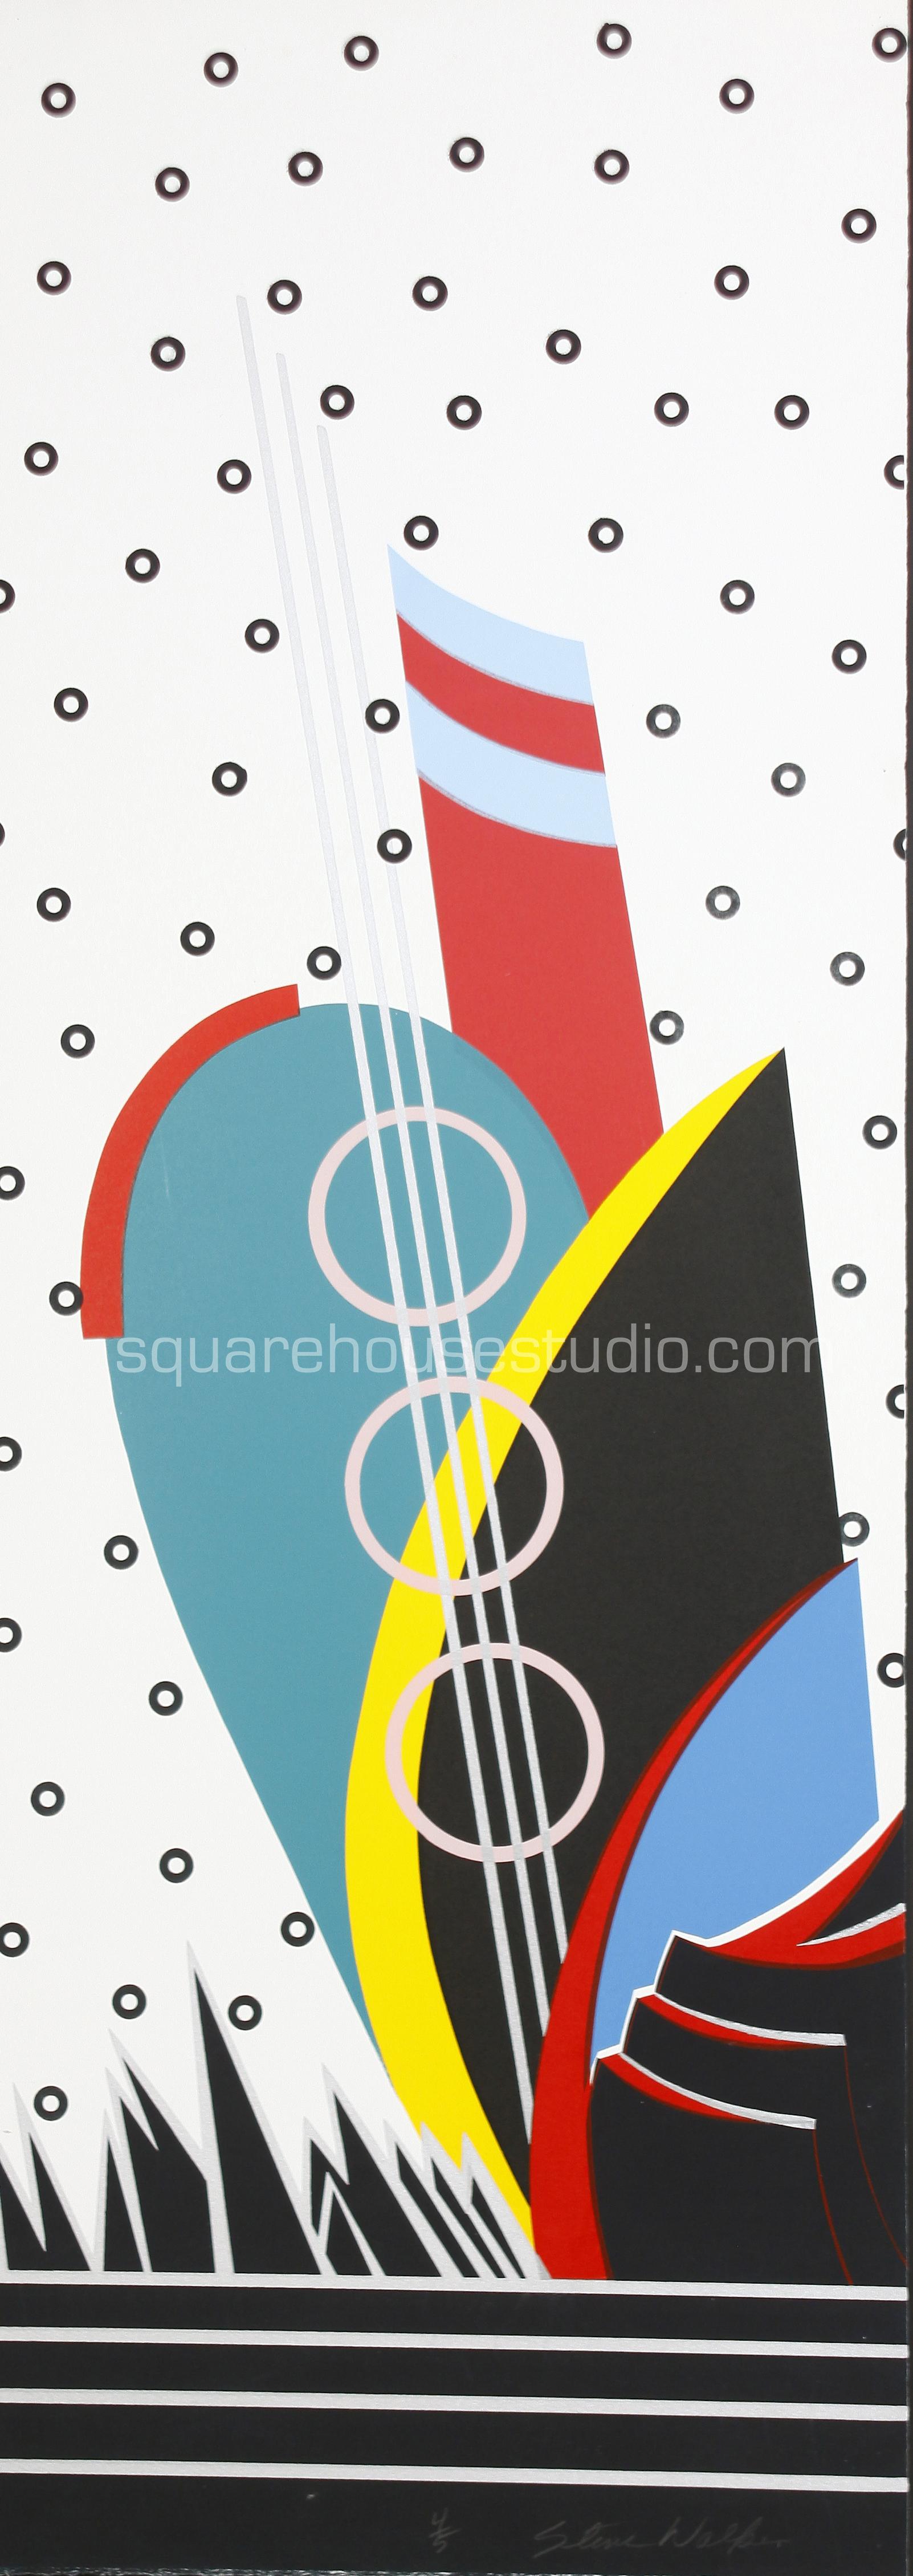 "Memphis Music , 16"" x 40,"" original edition, $625 framed / $475 unframed, Available as giclée print—$450 framed / $300 unframed"